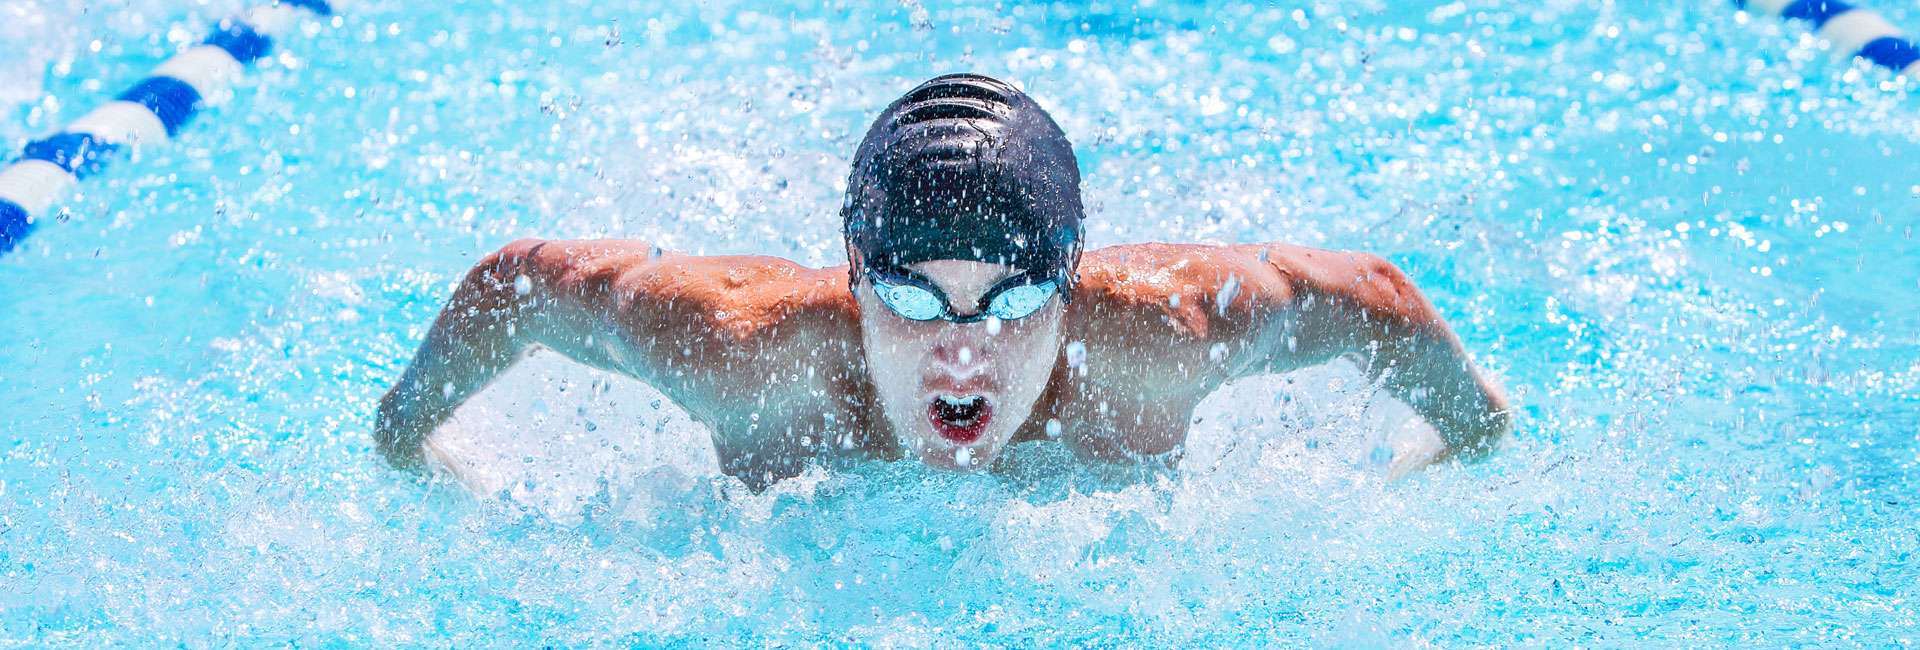 Swimmer doing butterfly